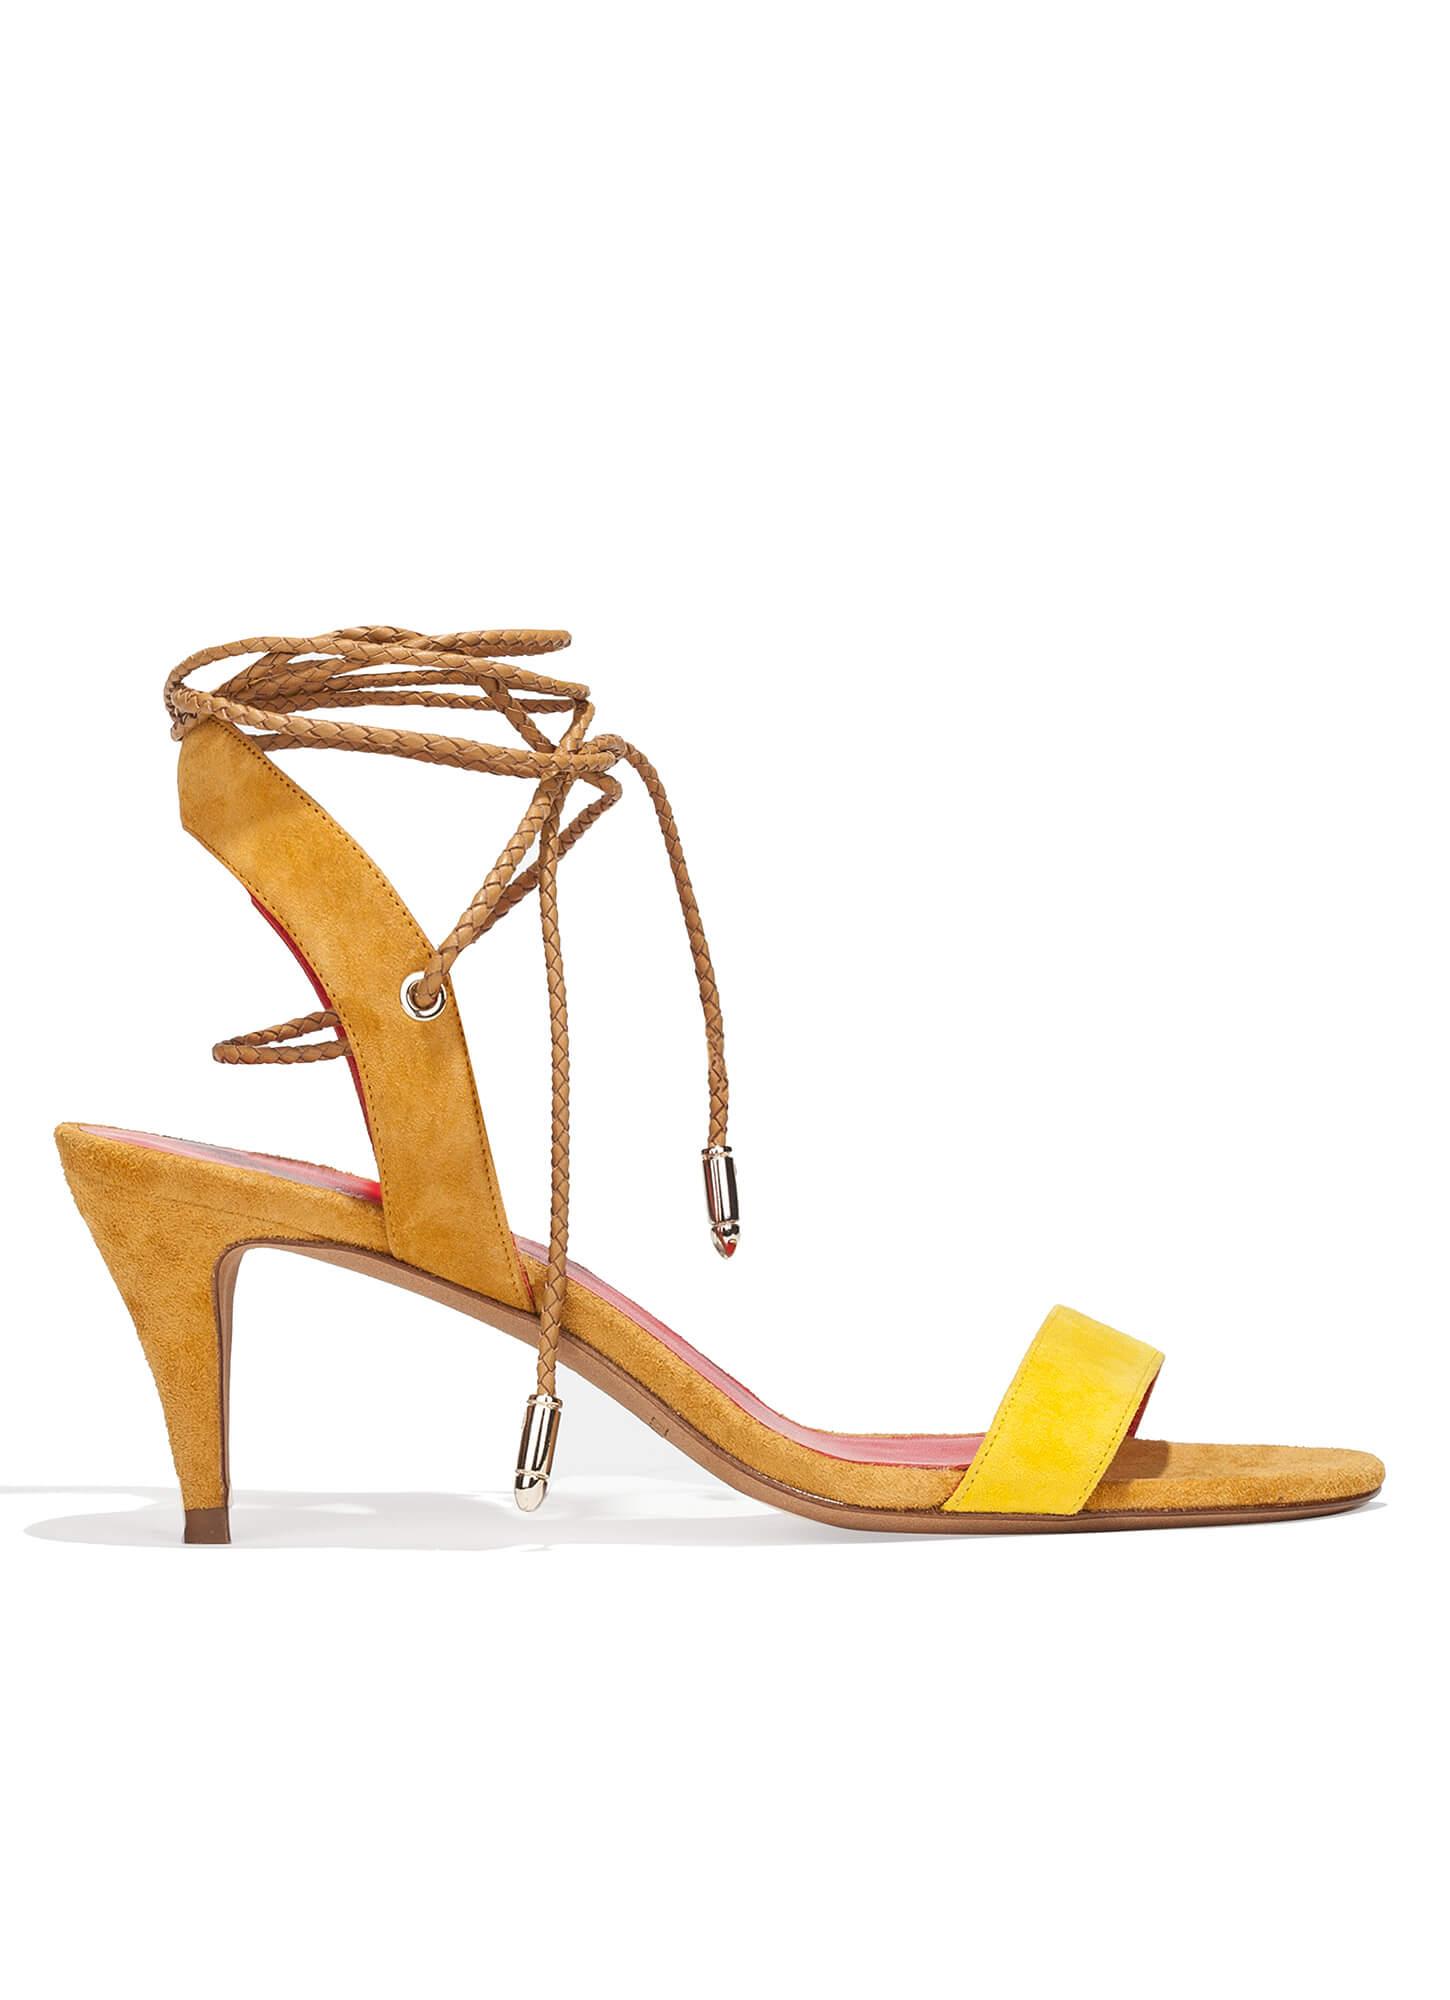 449c63d37f4c Mid heel sandals in two-tone suede - online shoe store Pura Lopez ...